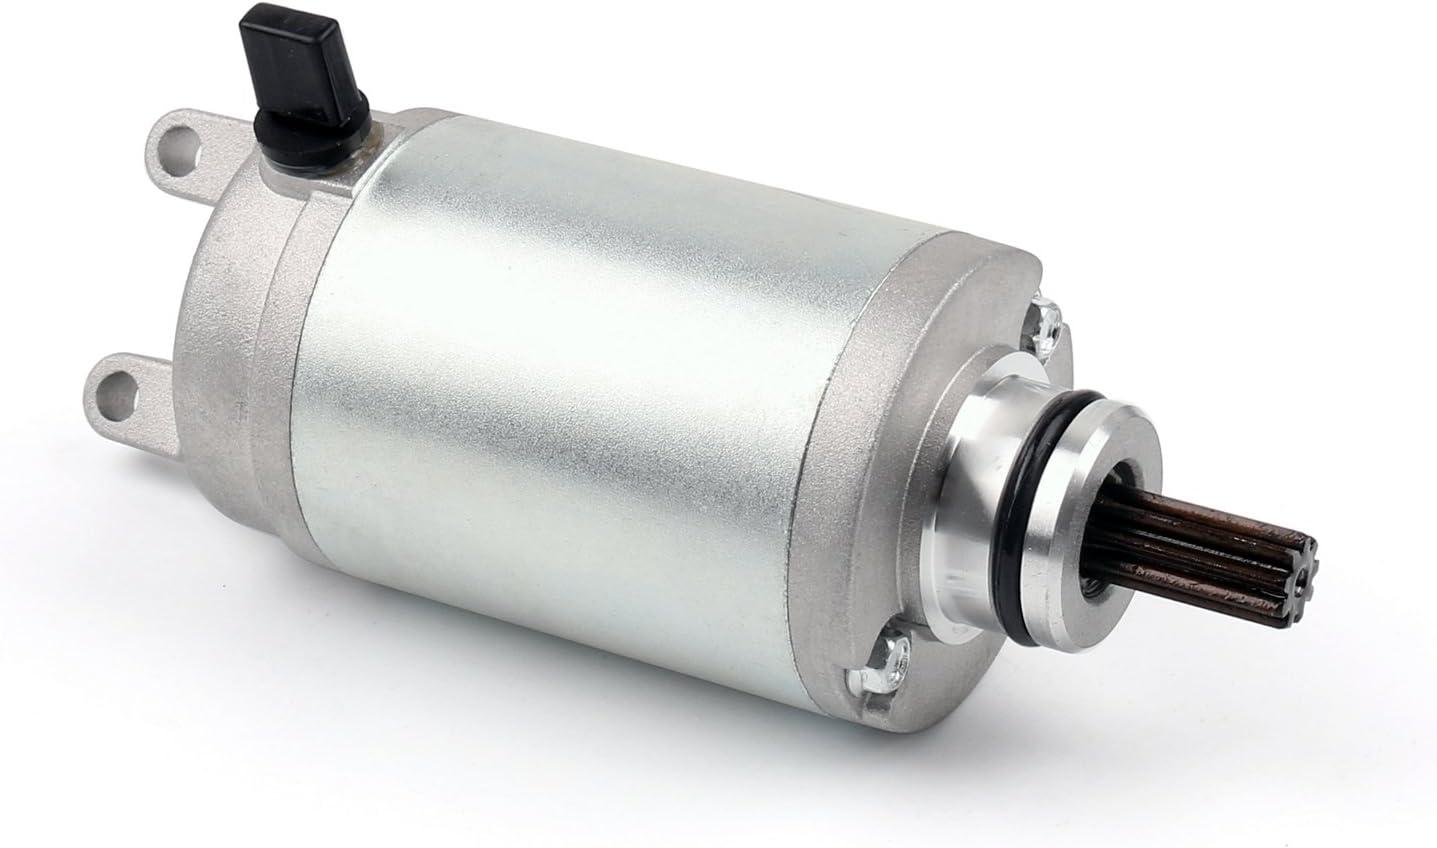 Artudatech Motor de arranque para motocicleta para SUZU-KI AN250//400 Burgman UH200 UH125 UH150 Burgman 12 V